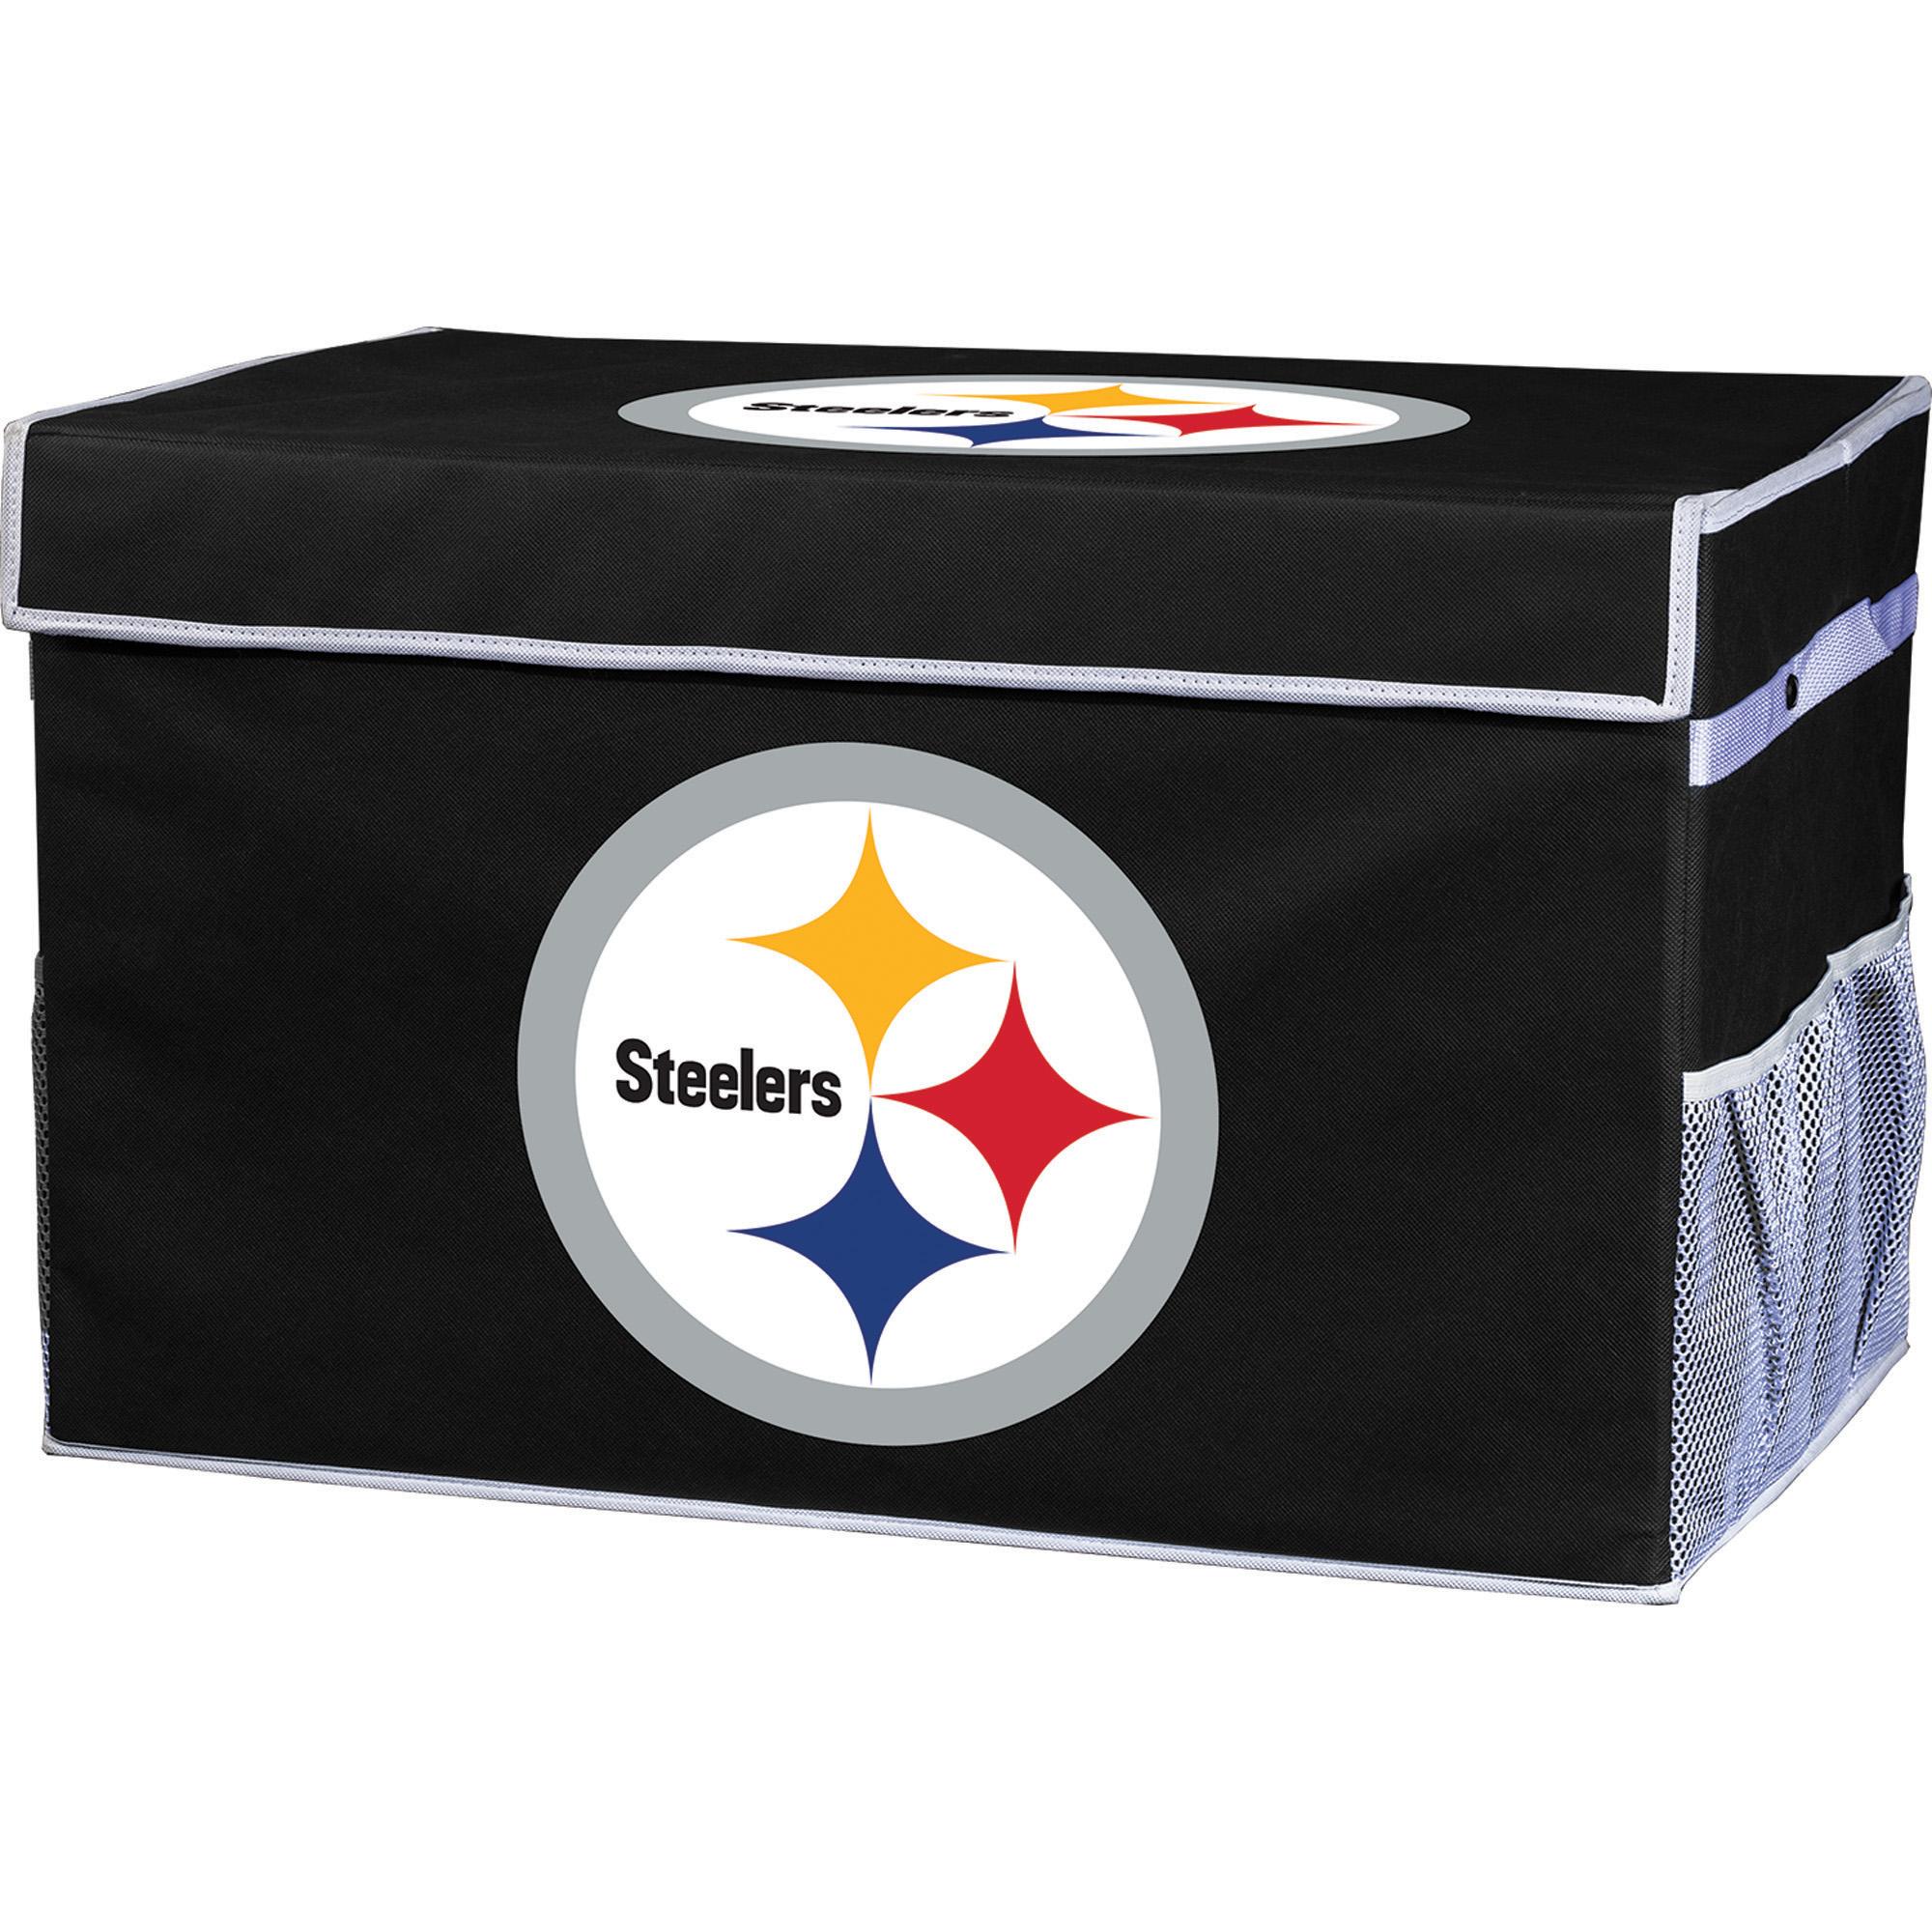 Franklin Sports NFL Pittsburgh Steelers Collapsible Storage Footlocker Bins - Large